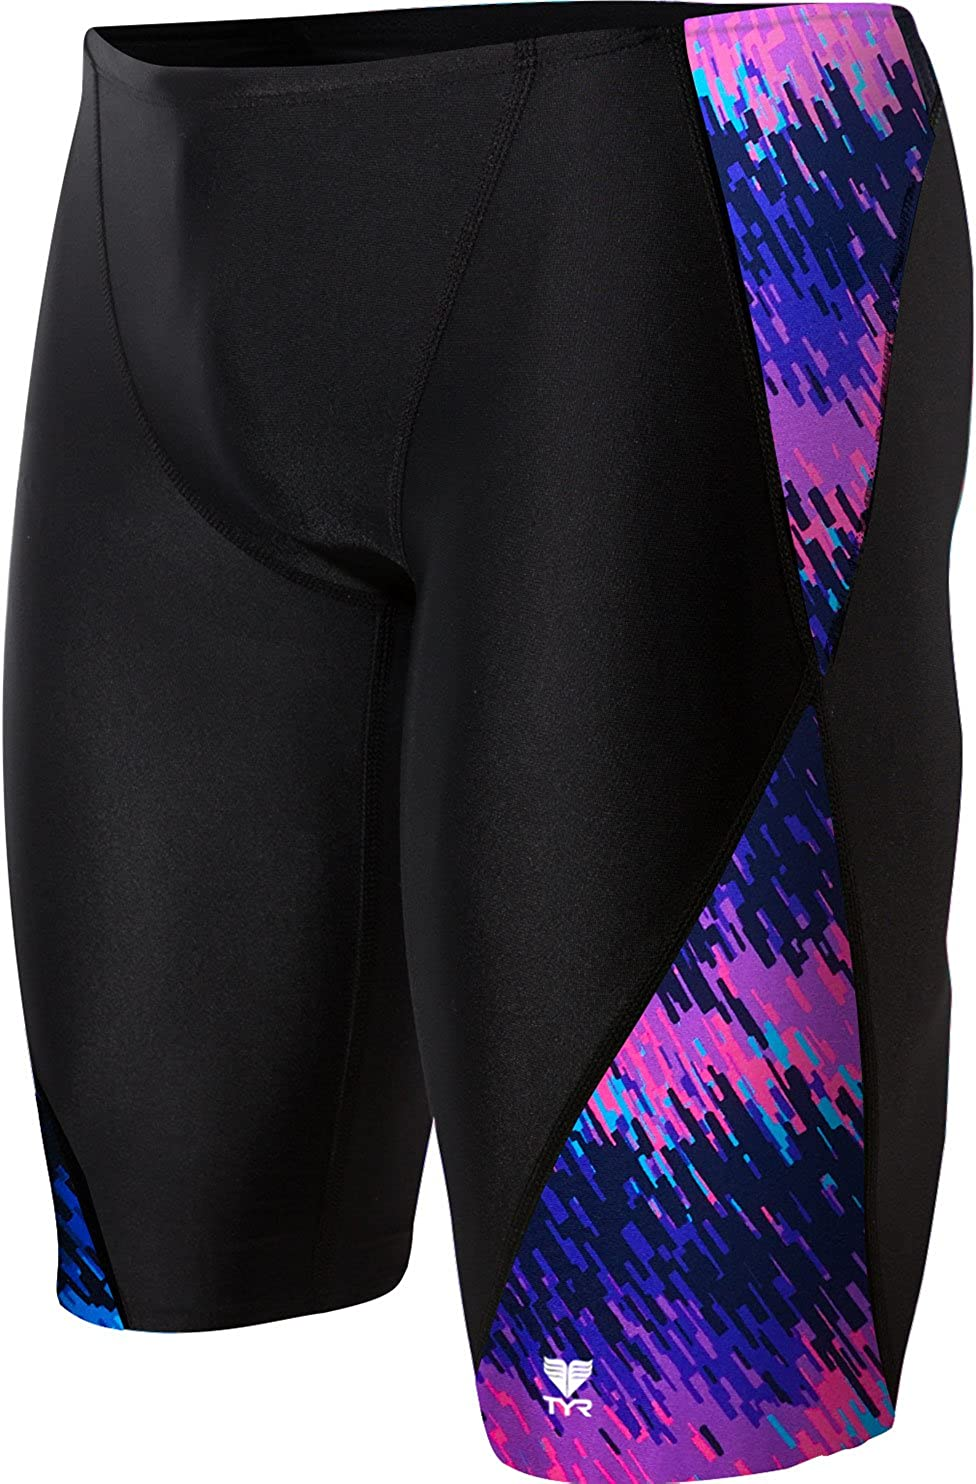 TYR Boys/' Perseus Jammer Swimsuit